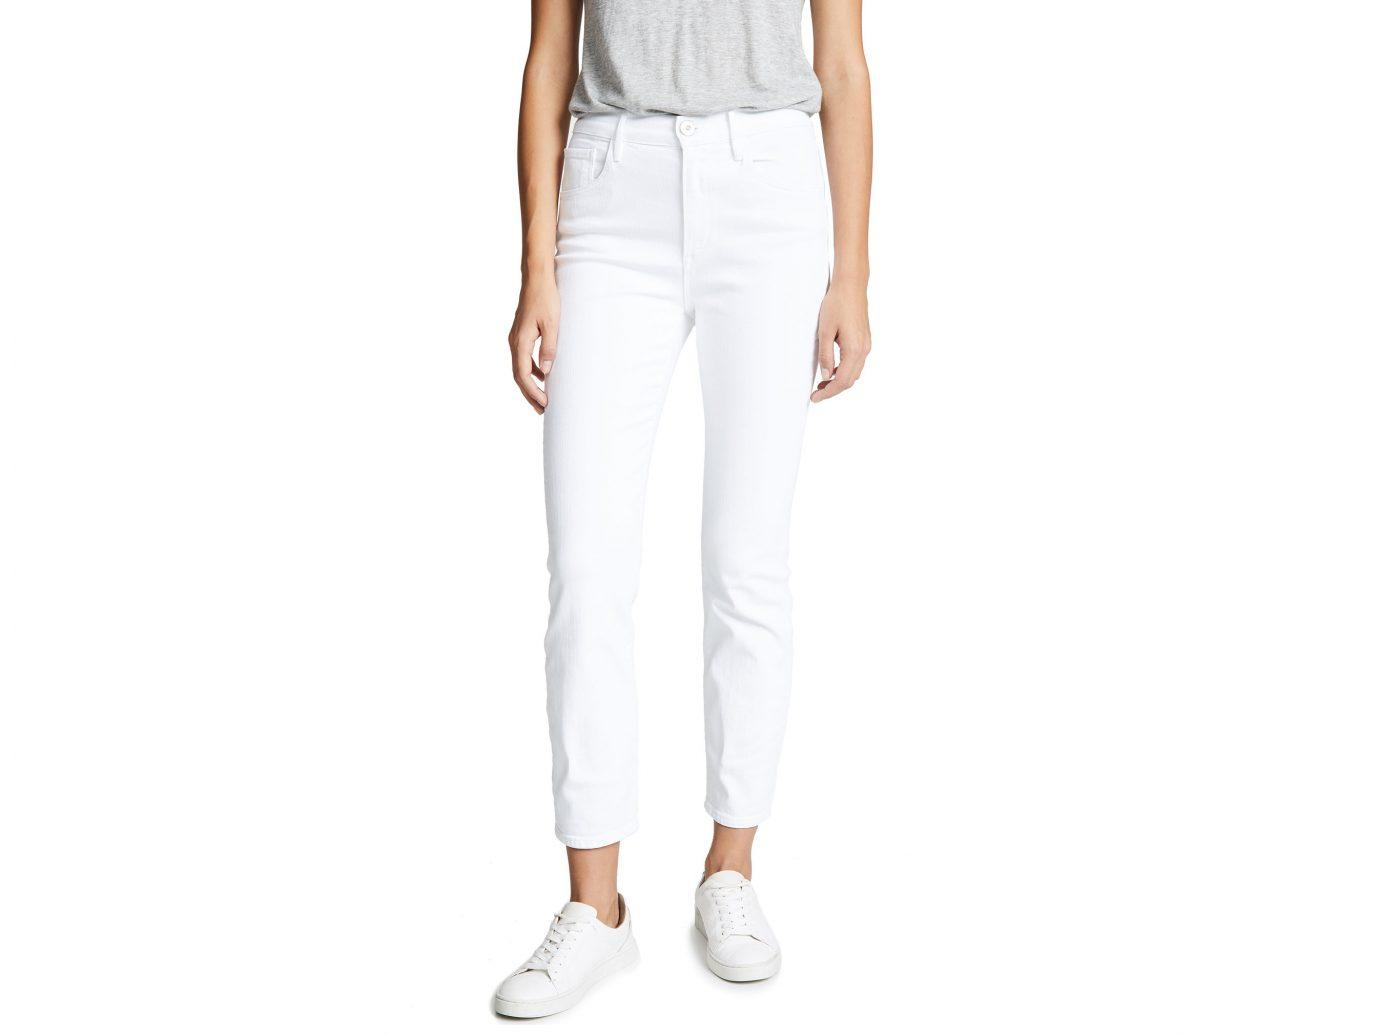 3x1Colette Slim Crop Jeans